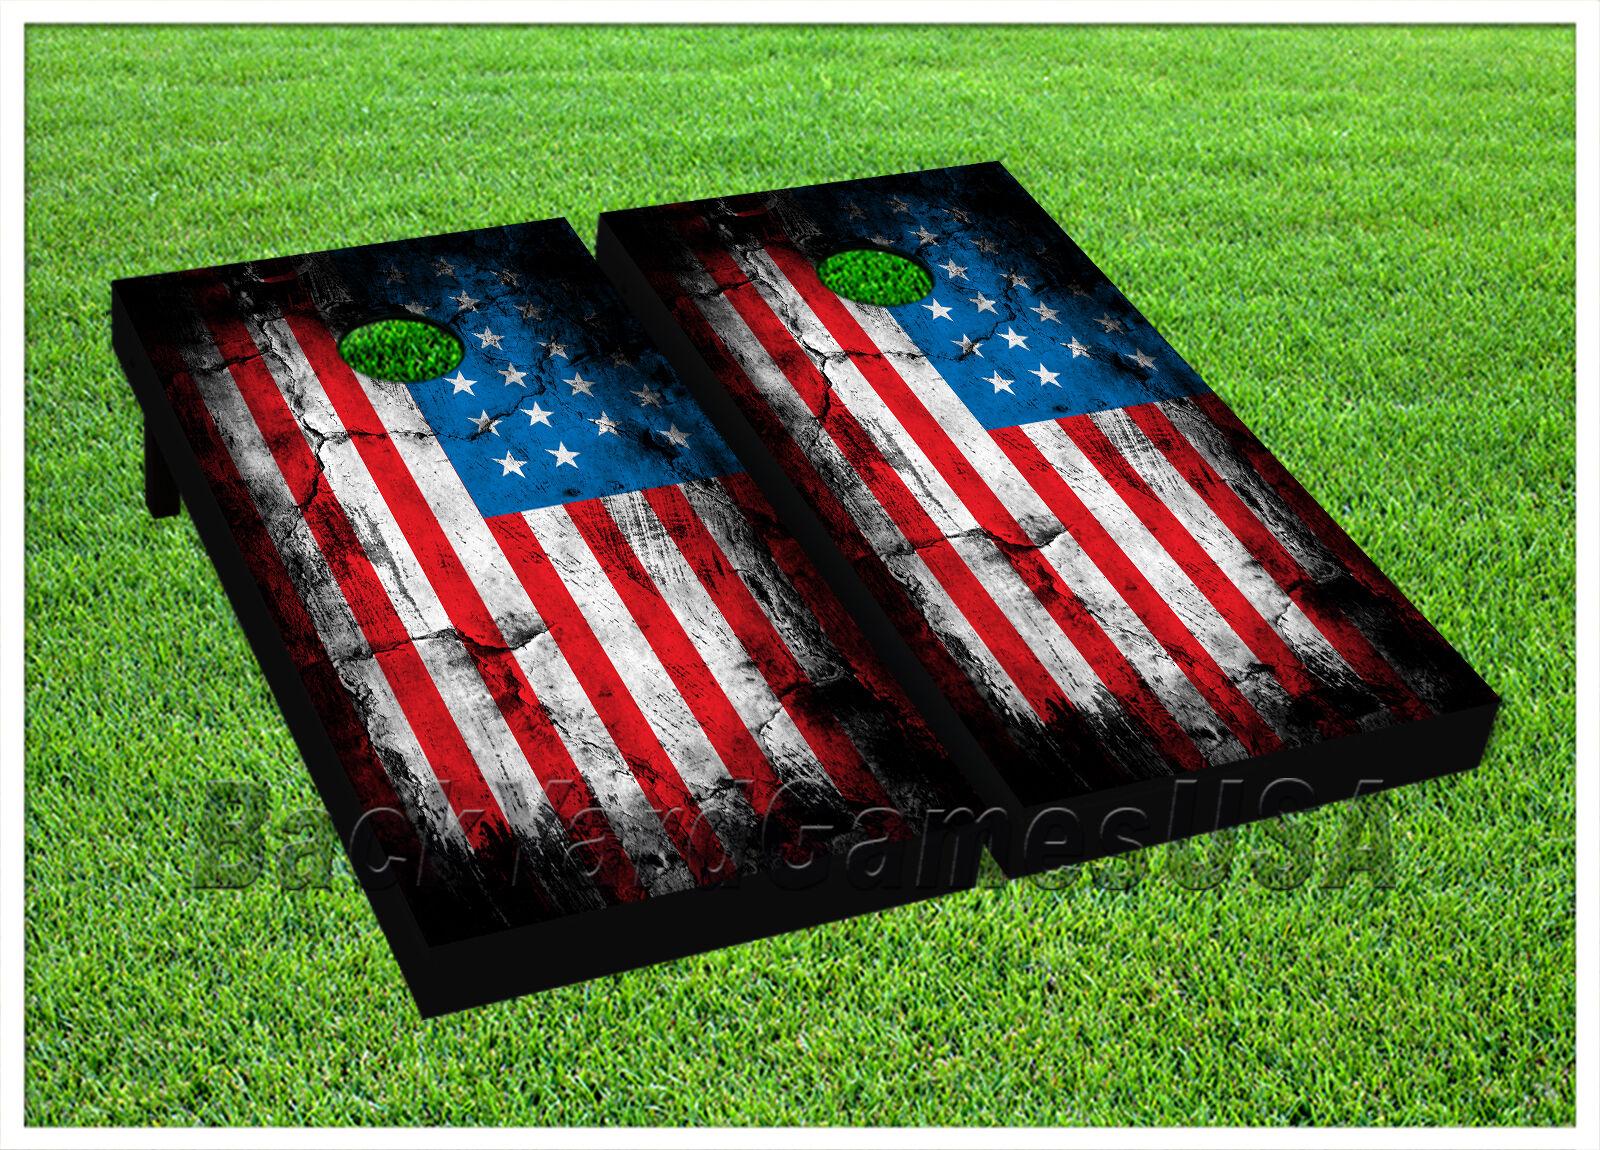 CORNHOLE BEANBAG TOSS GAME w Bags Game Boards American Flag USA Stars Set 977